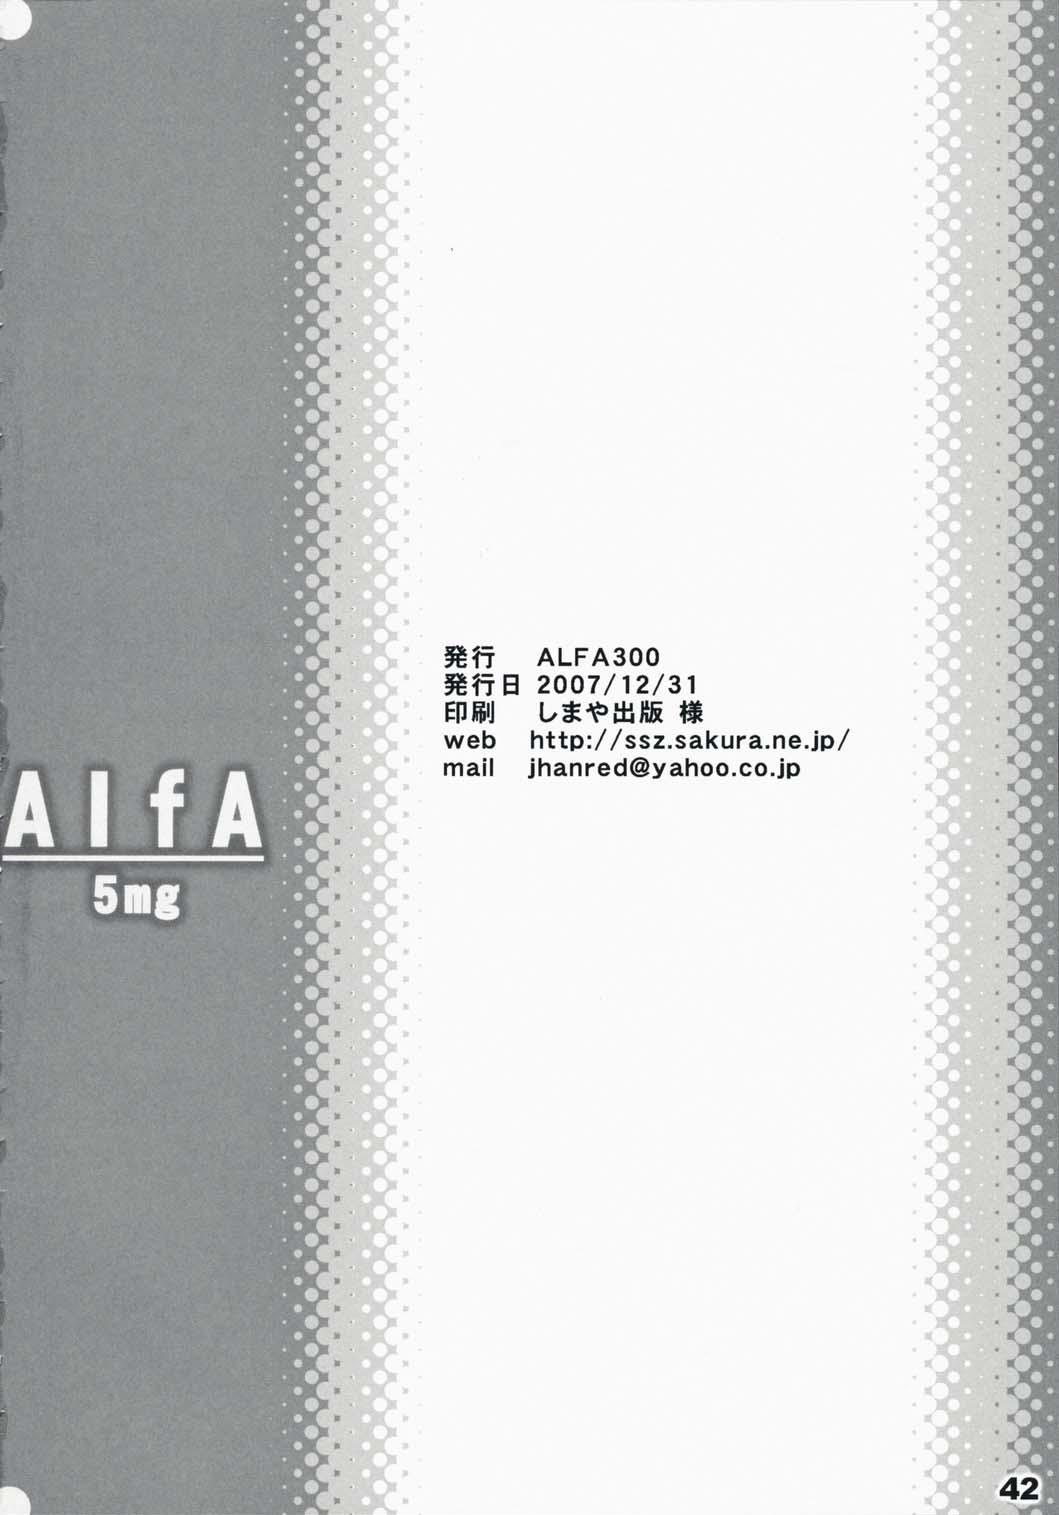 AlfA 5mg 40